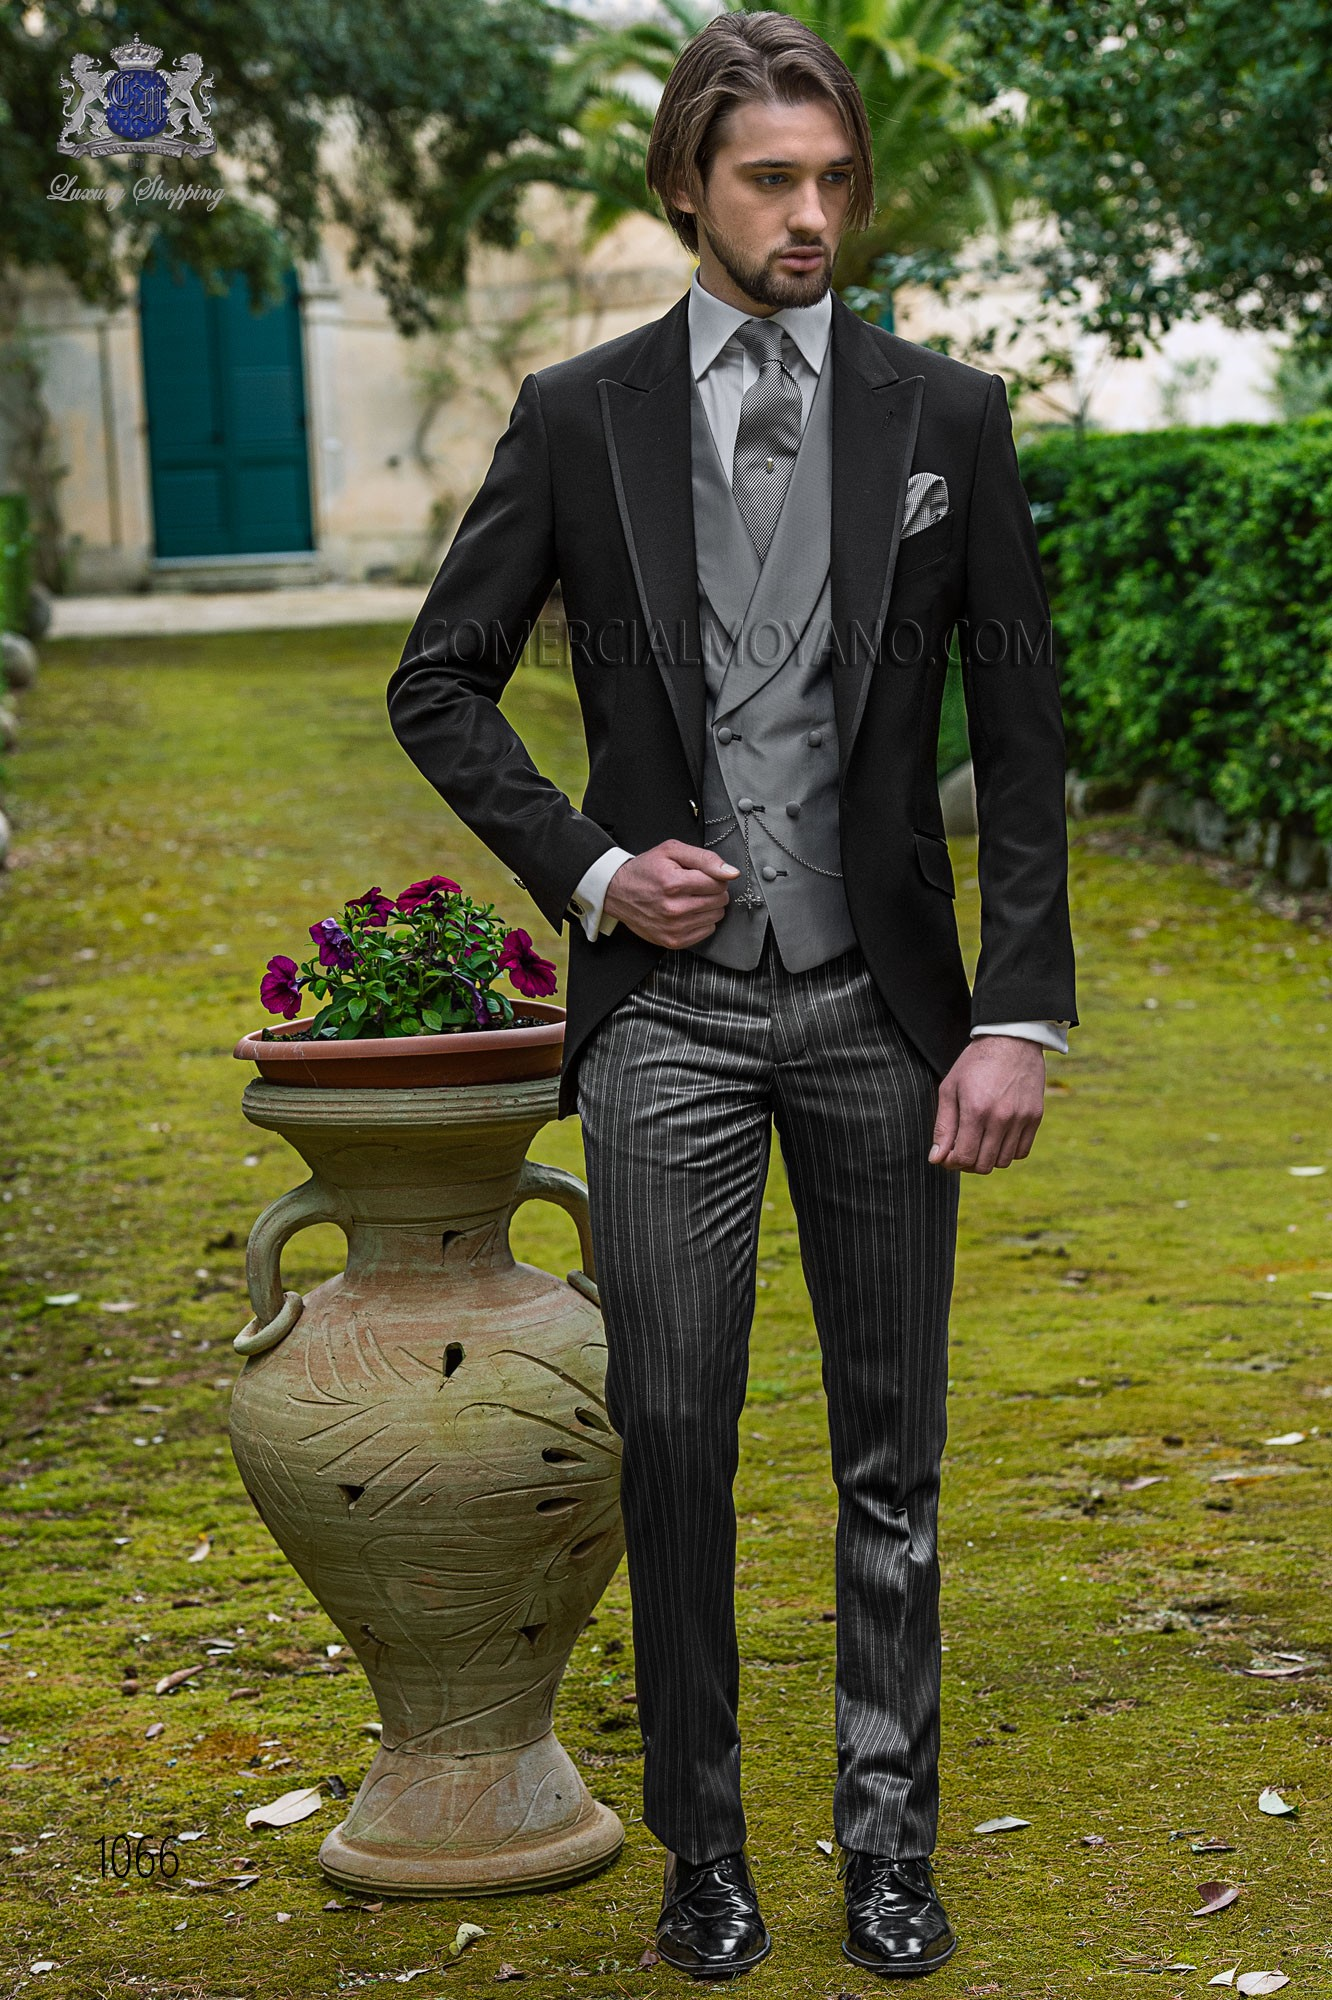 Italian bespoke black wedding suit style 1066 Ottavio Nuccio Gala.